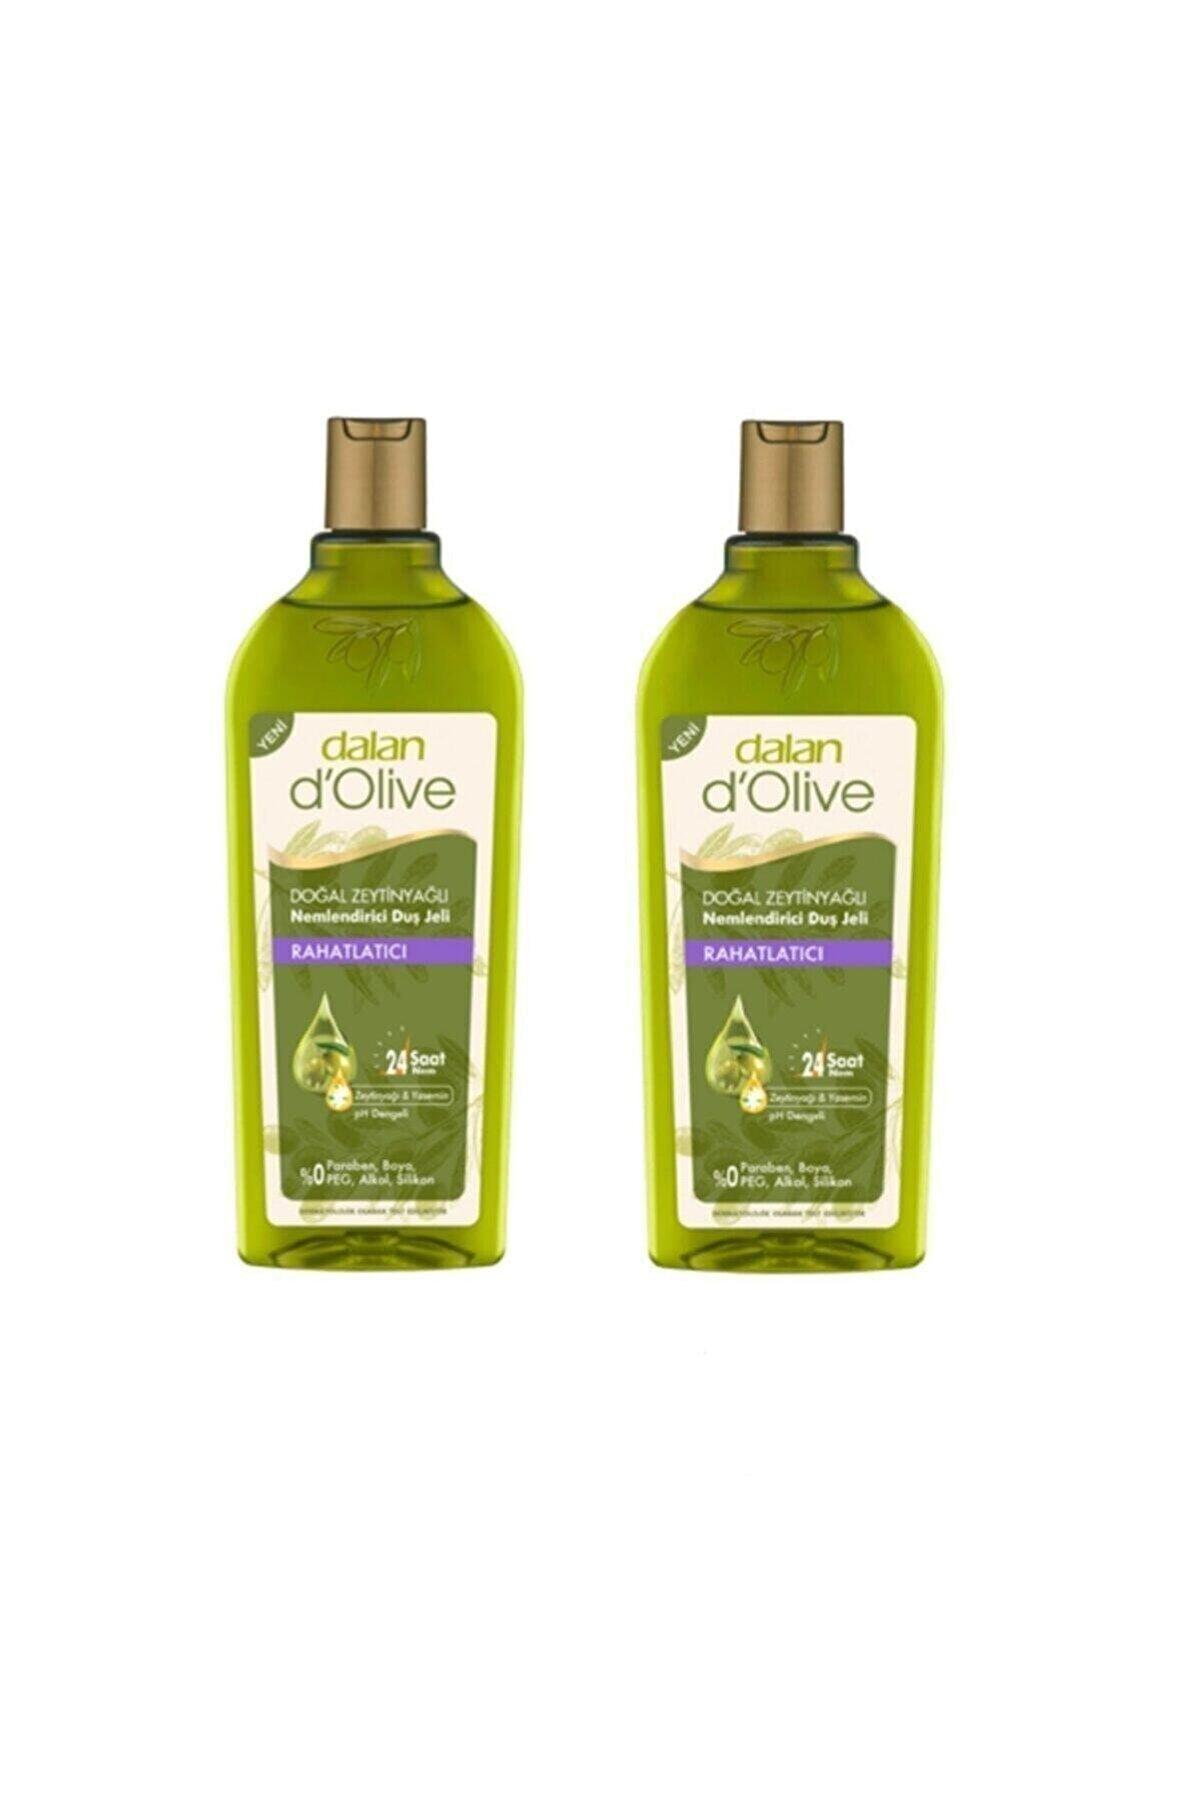 Dalan D'olive Zeytinyağlı Rahatlatıcı Duş Jeli 400 Ml X 2 Ad